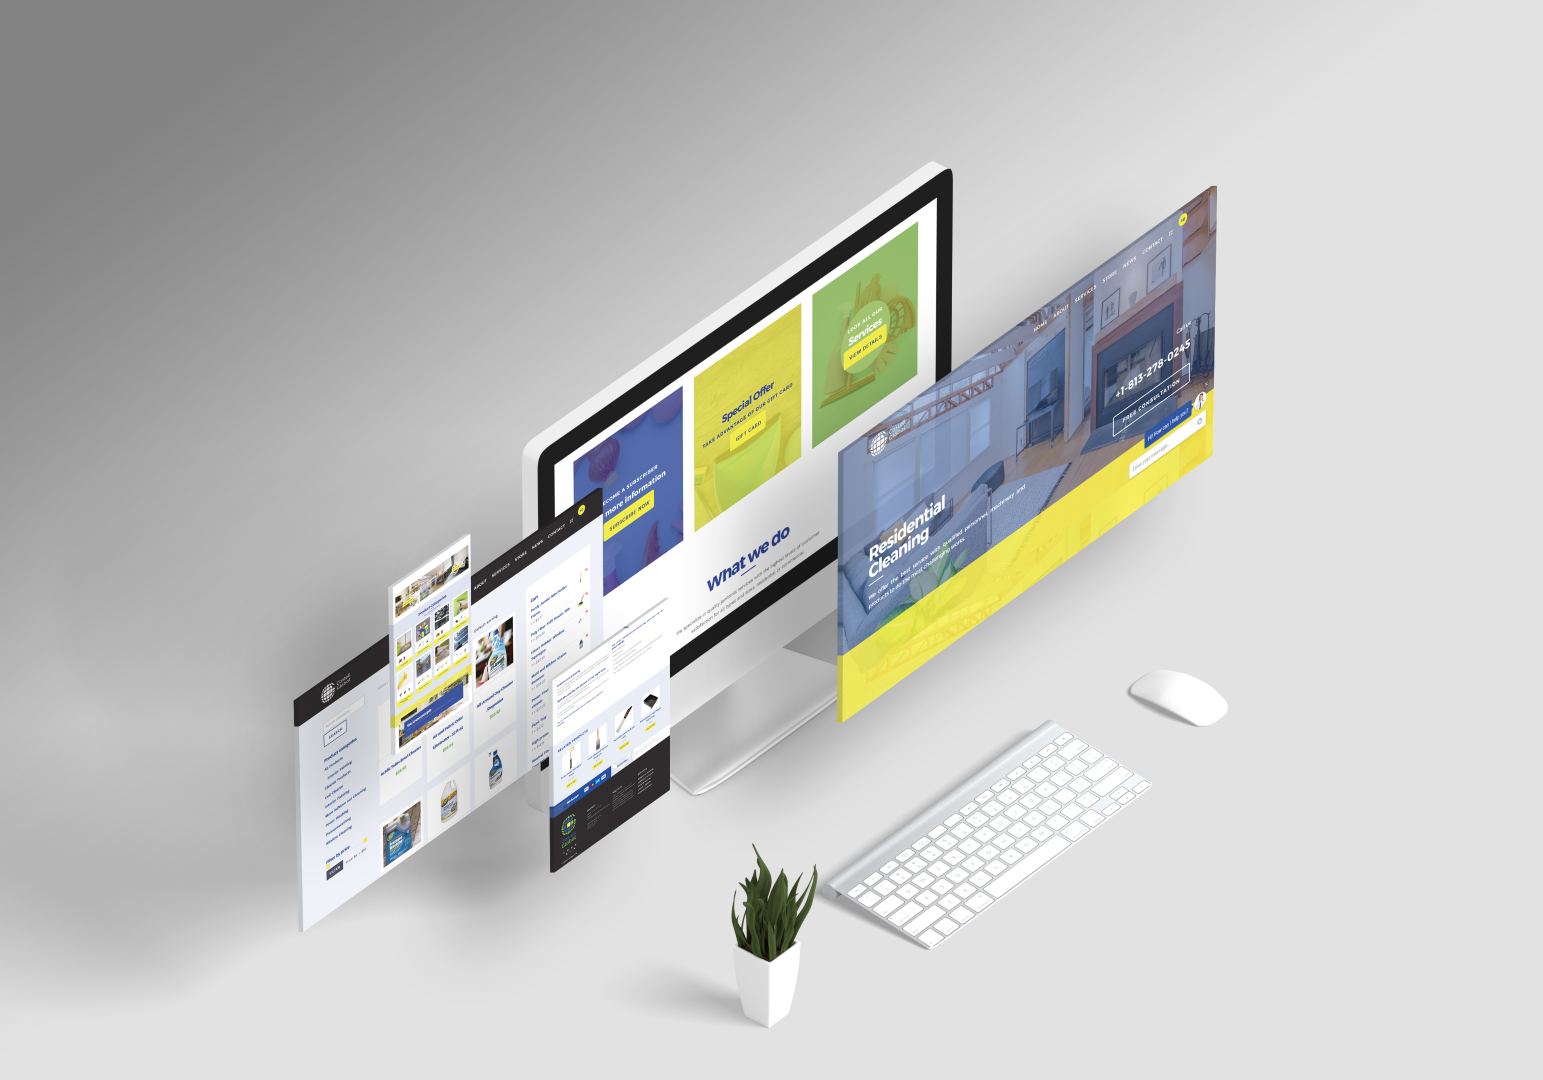 Tienda online Castell Global Services